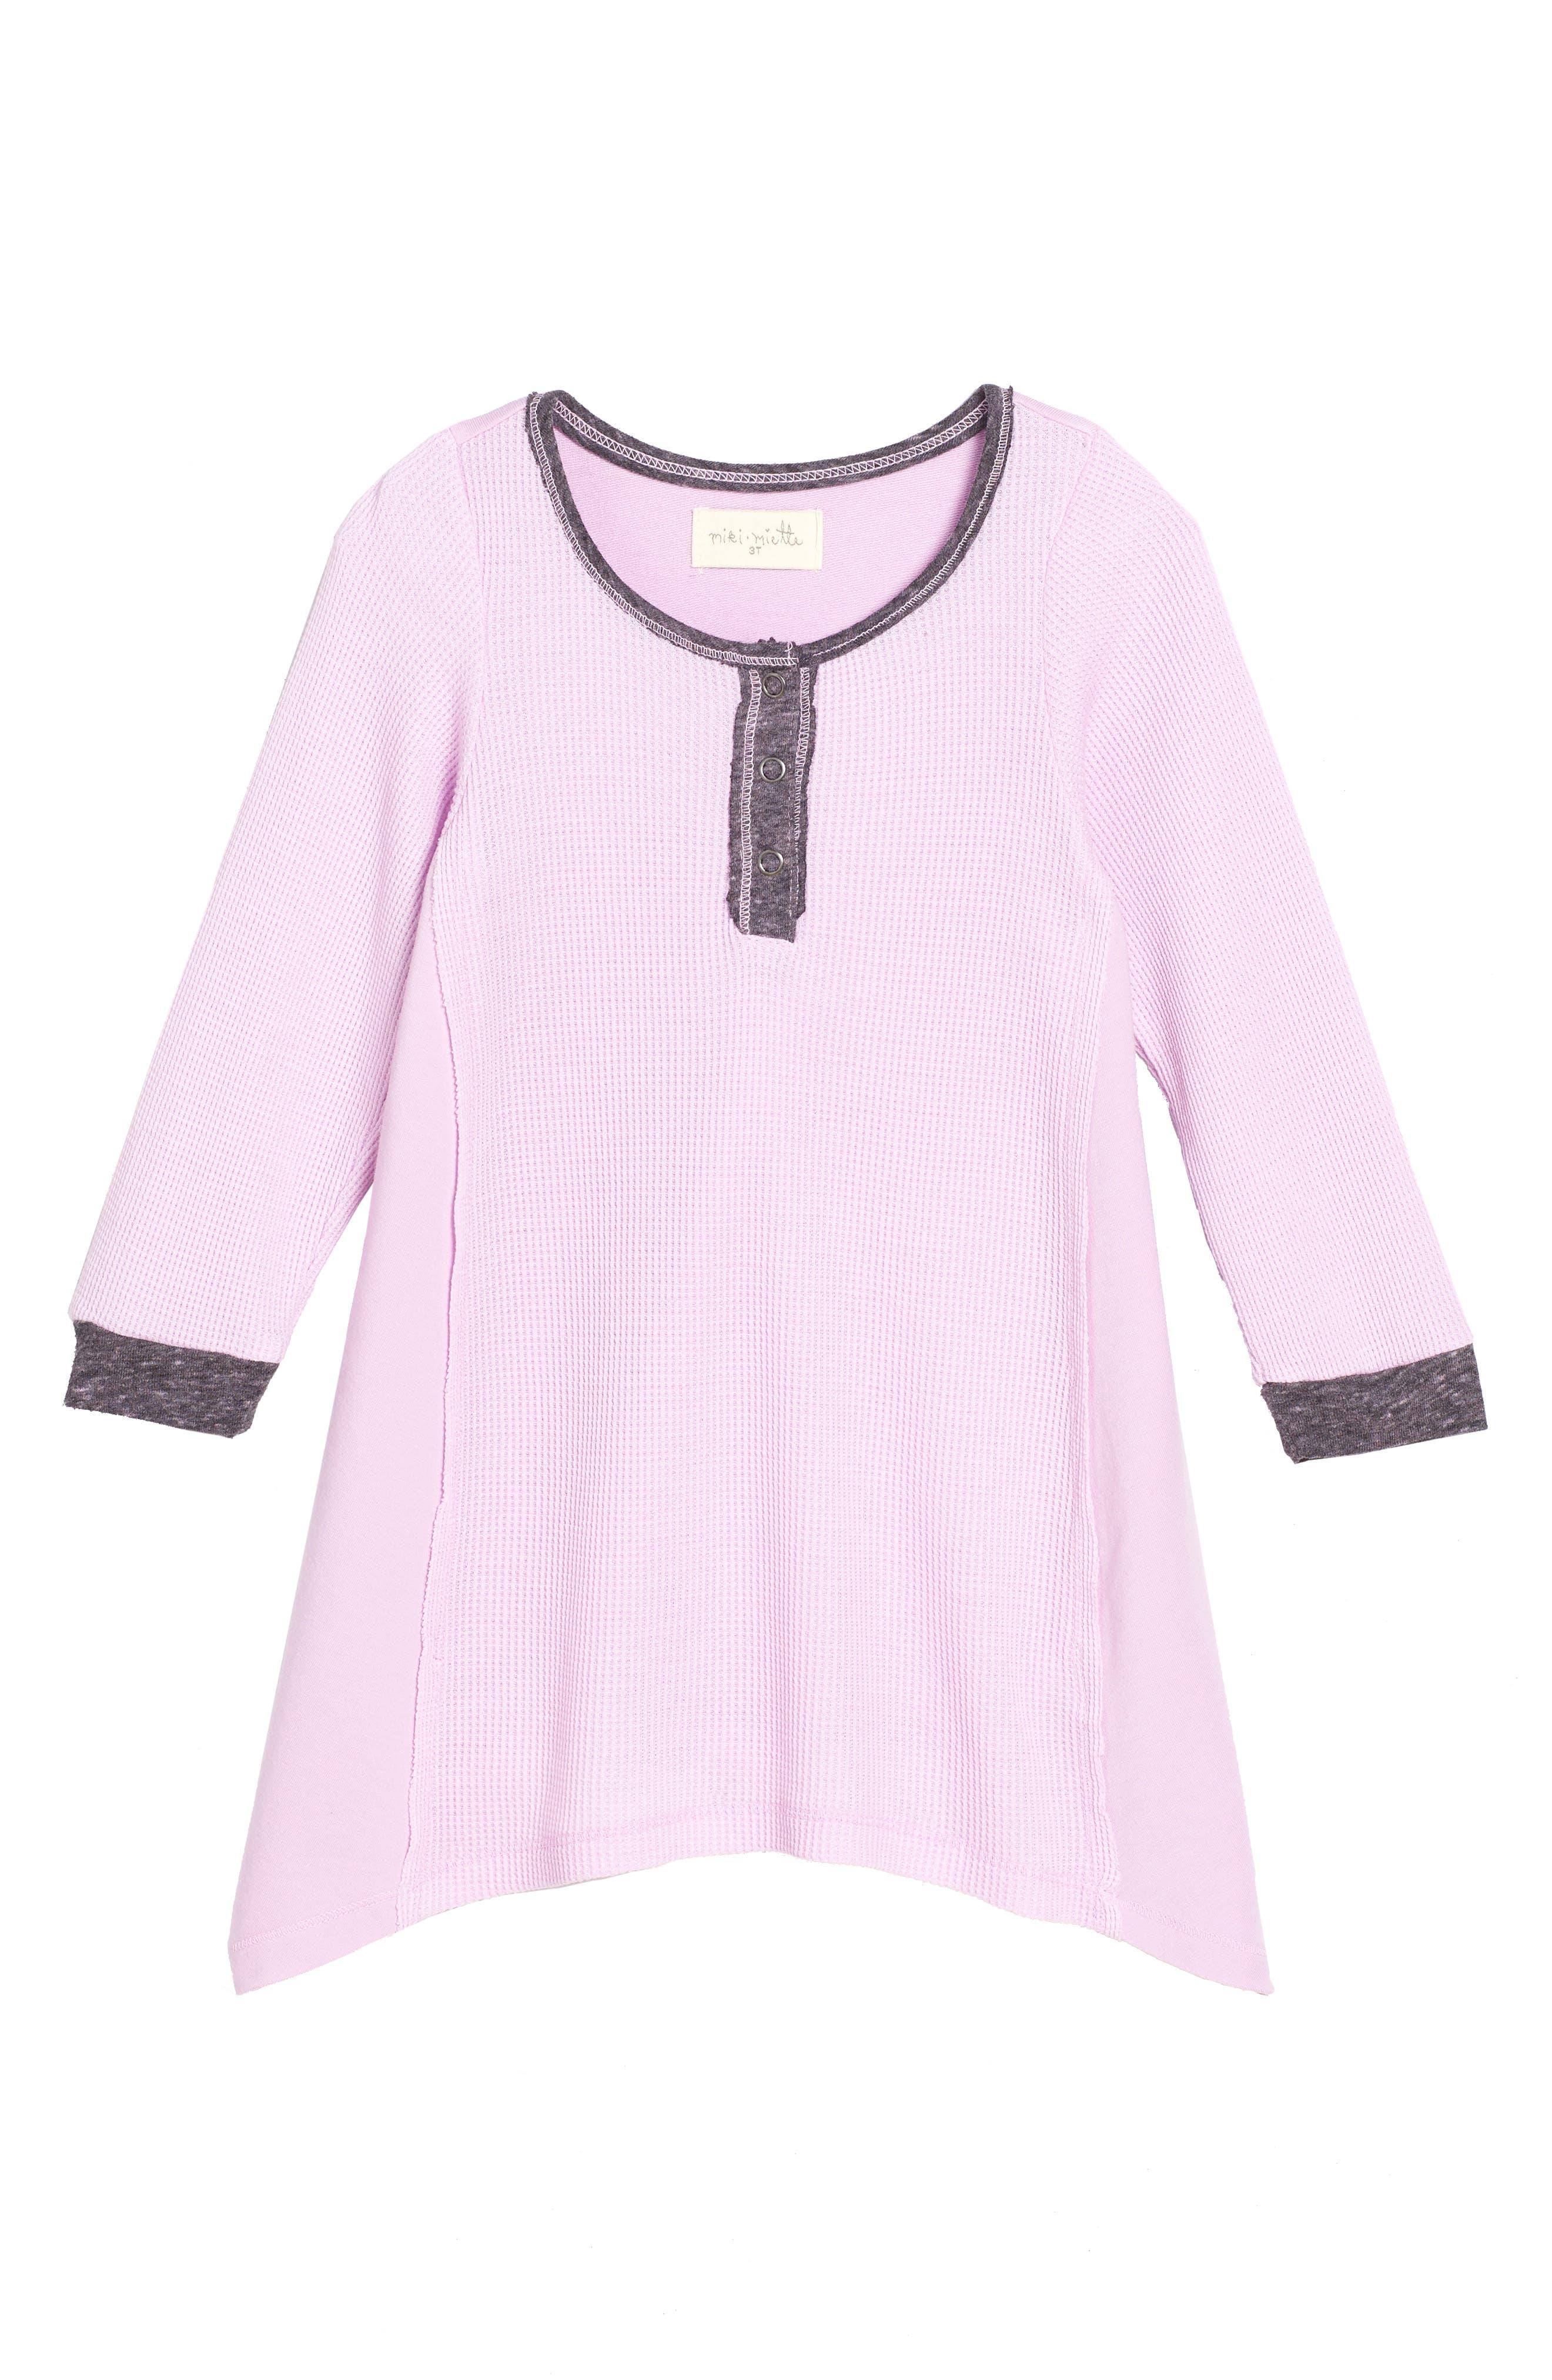 Main Image - Miki Miette Riley Thermal Dress (Toddler Girls & Little Girls)